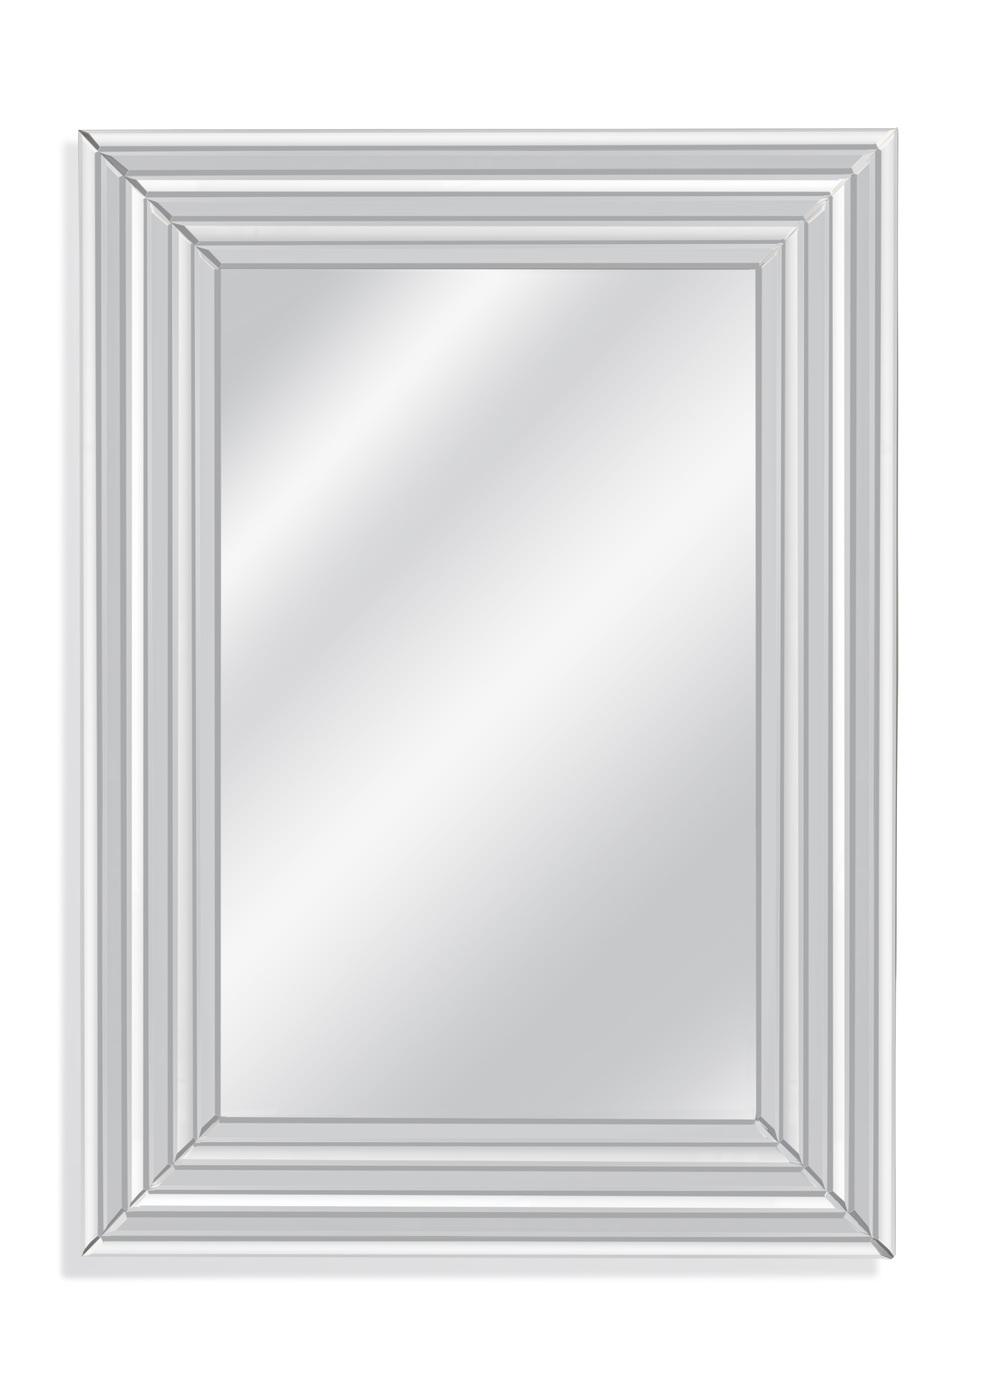 Bassett Mirror Company - McKinley Wall Mirror